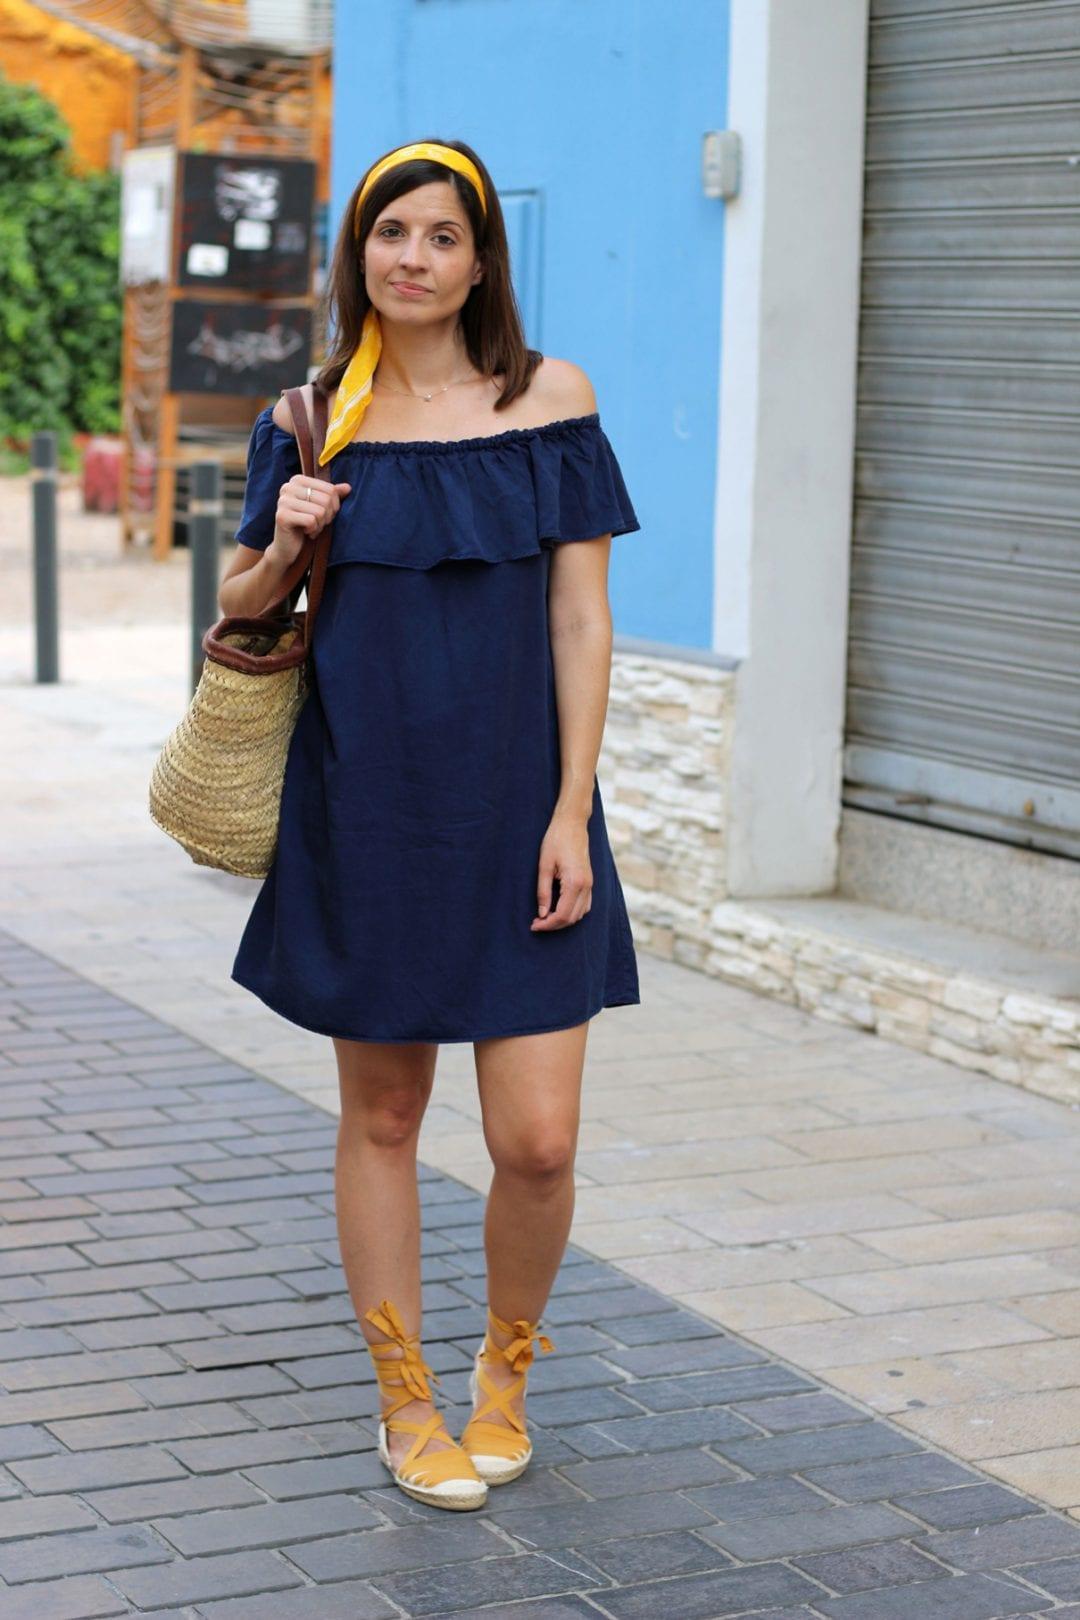 spanish fashion blogger sith off shoulders dress, espadrilles and basket